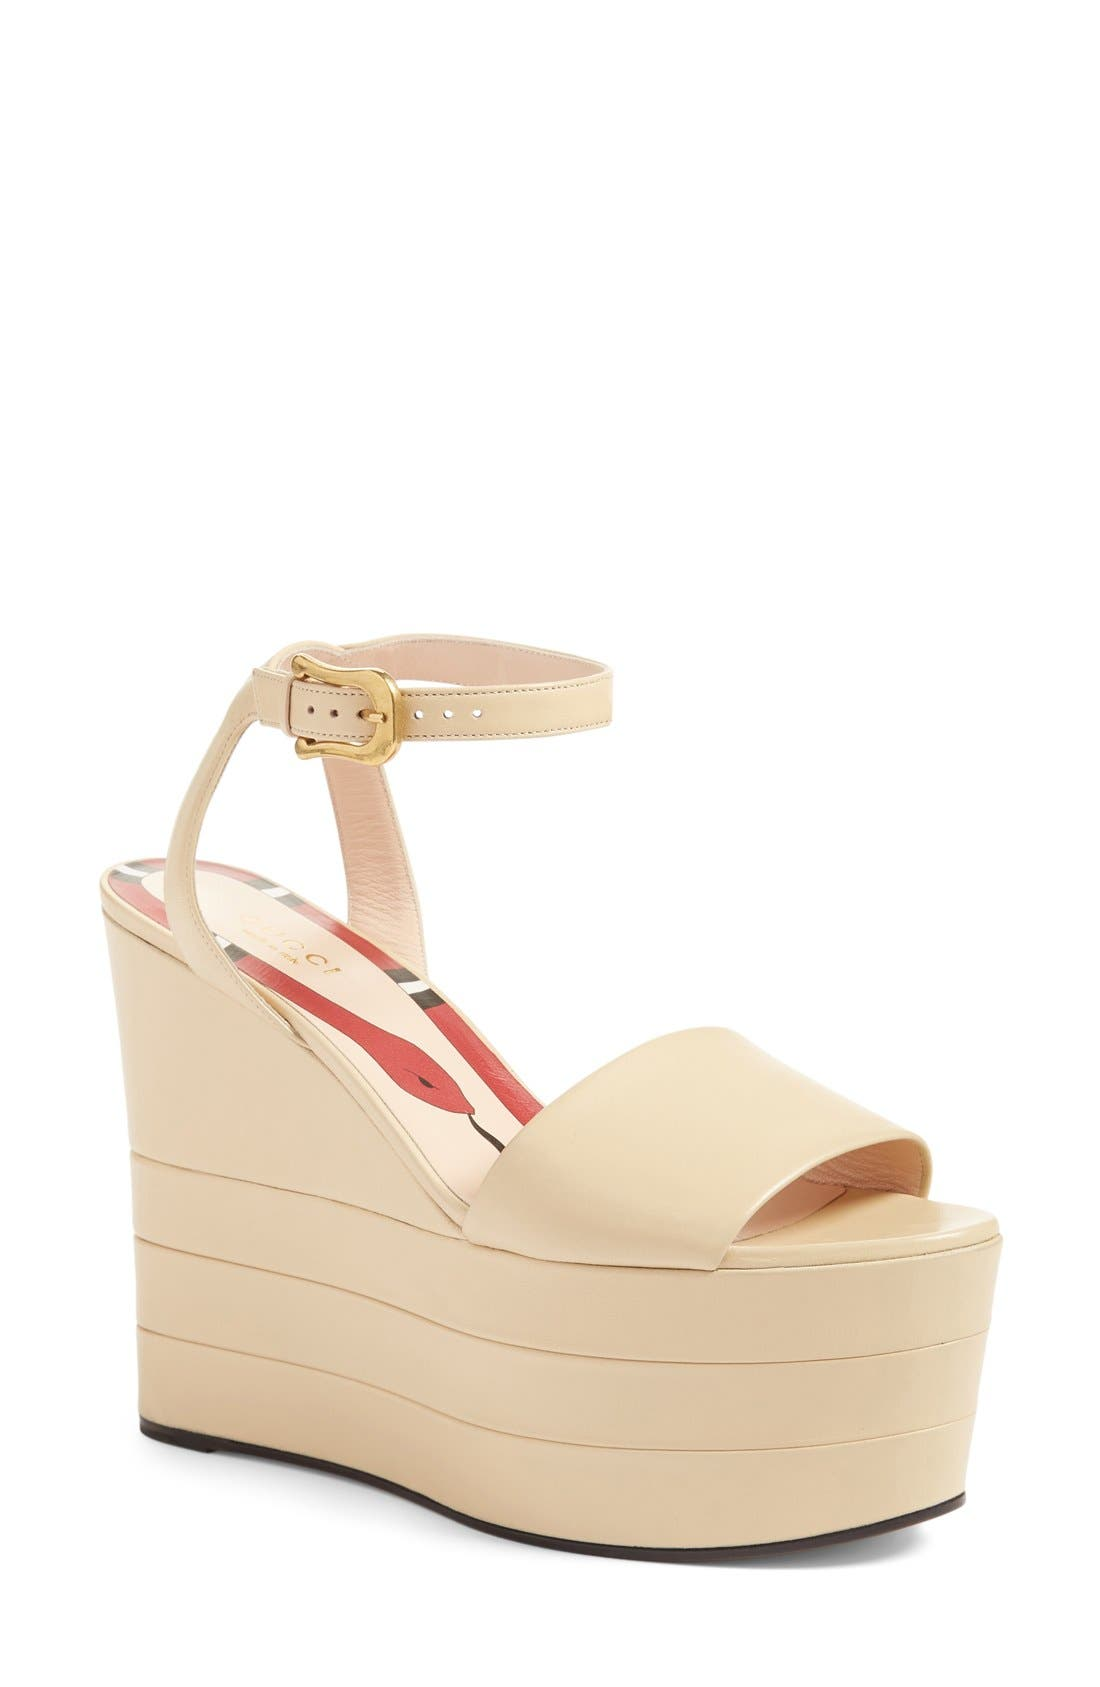 GUCCI 'Sally' Platform Sandal